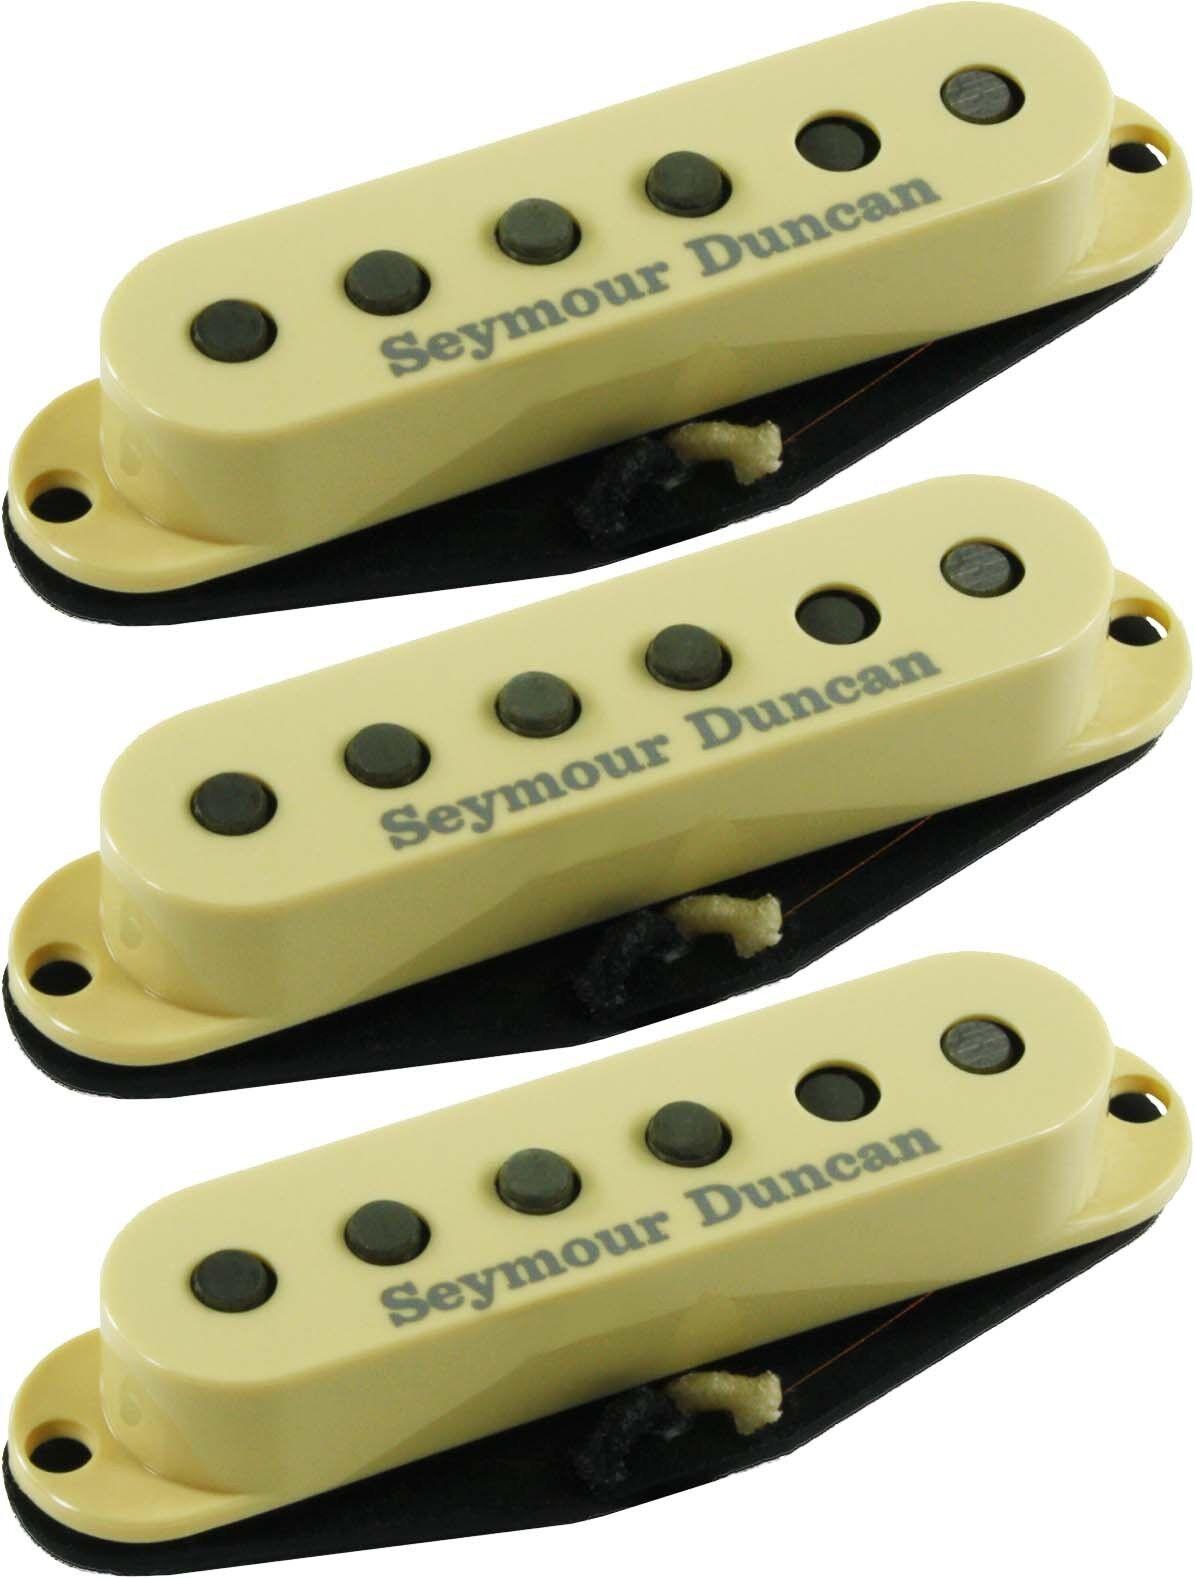 Seymour Duncan SSL-52s Five-Two Strat Neck Middle Bridge Pickup Set, Cream, NEW